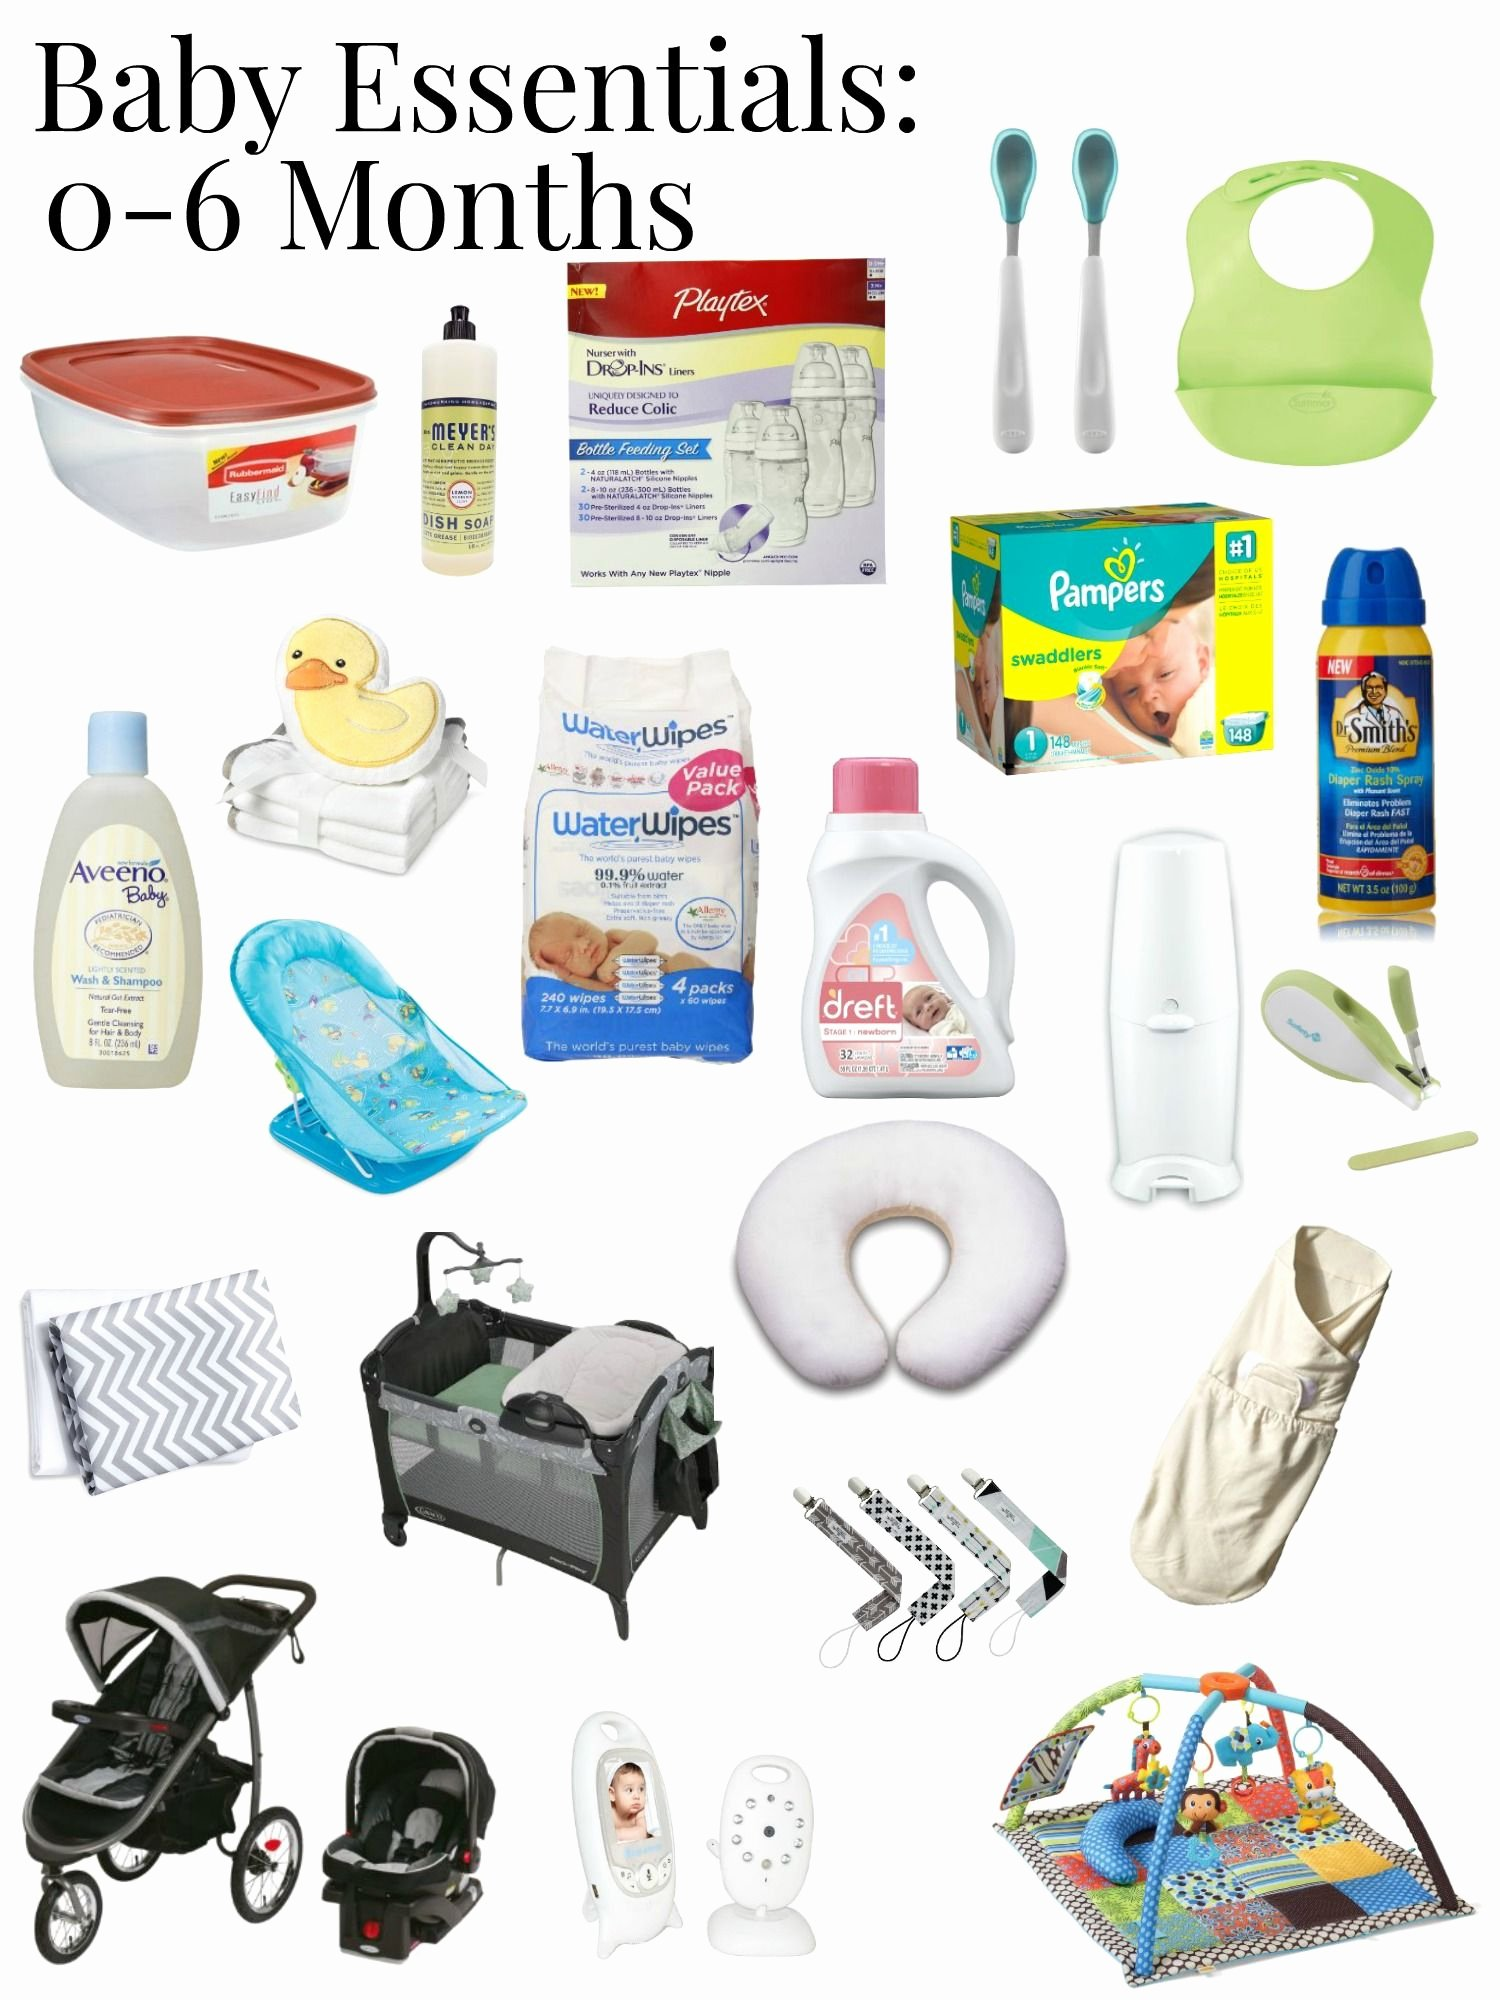 Newborn Essentials Checklist Best Of A Great List Of True Baby Essentials for the First 6